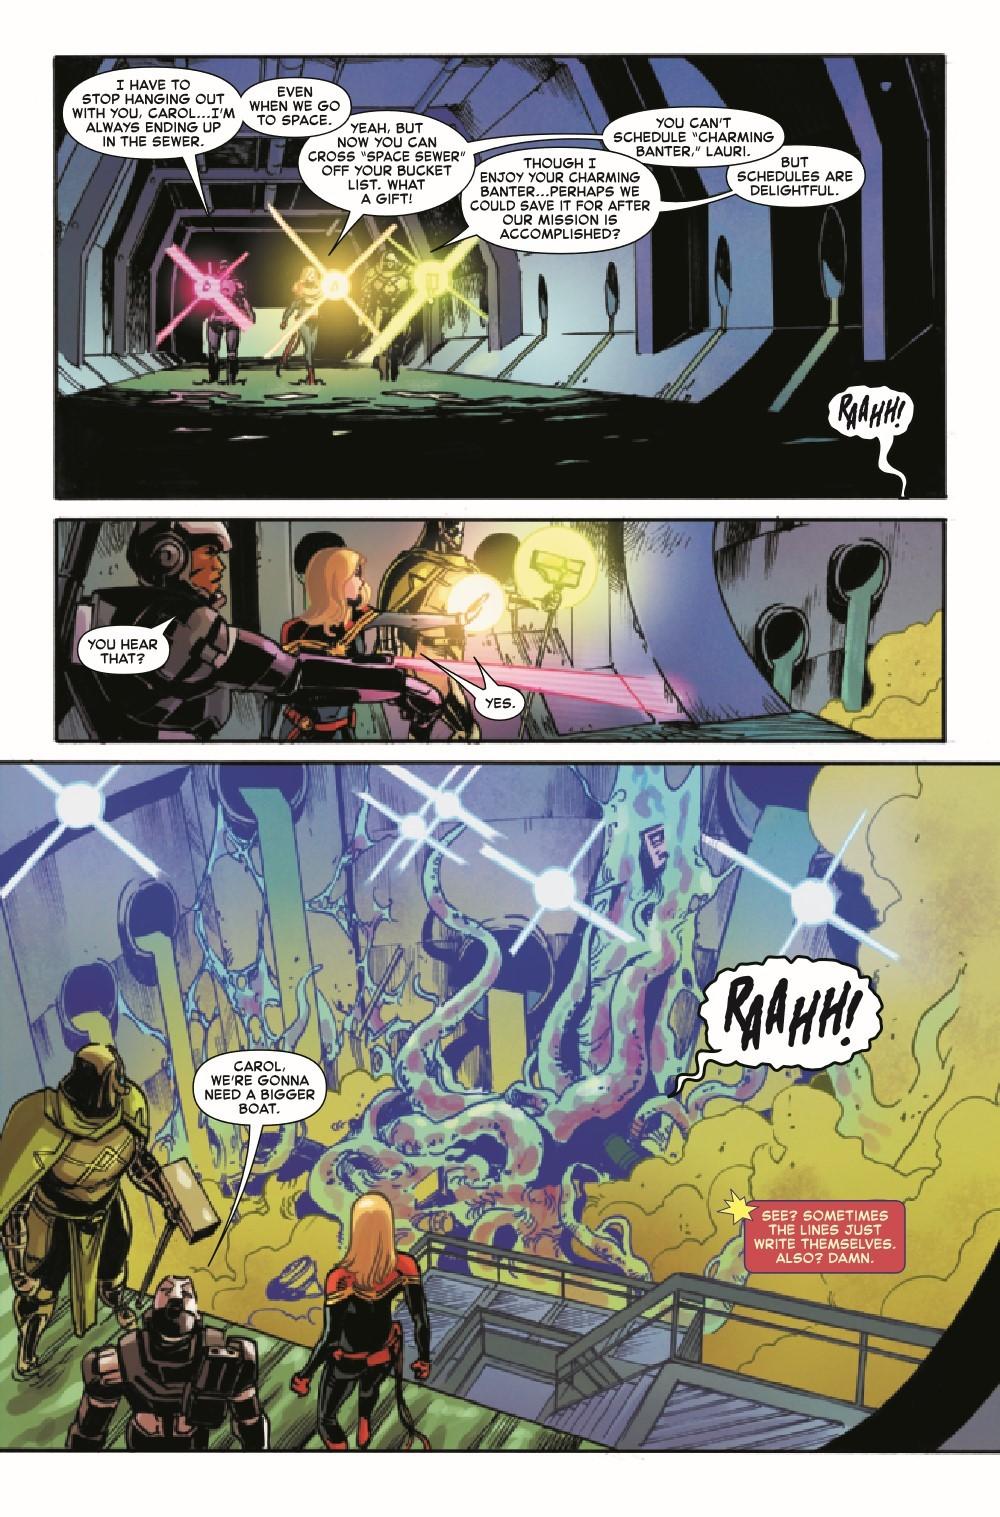 CAPMARV2019031_Preview-6 ComicList Previews: CAPTAIN MARVEL #31